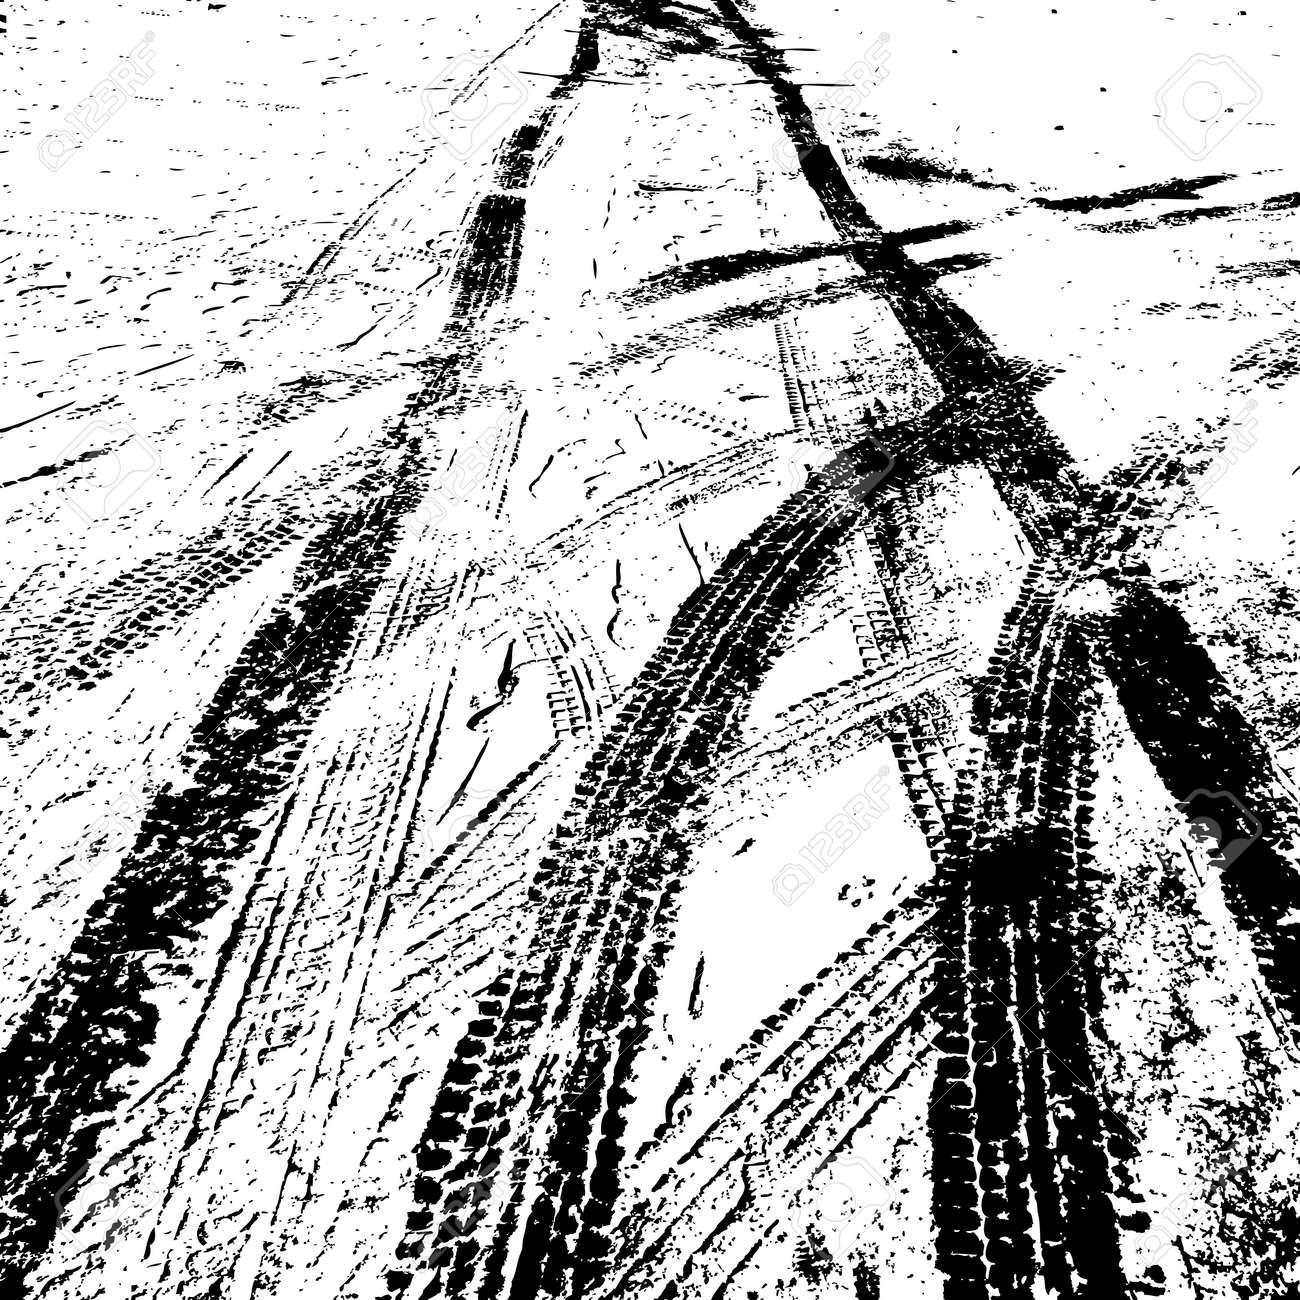 Grunge background with black tire track. Vector illustration. - 52825709